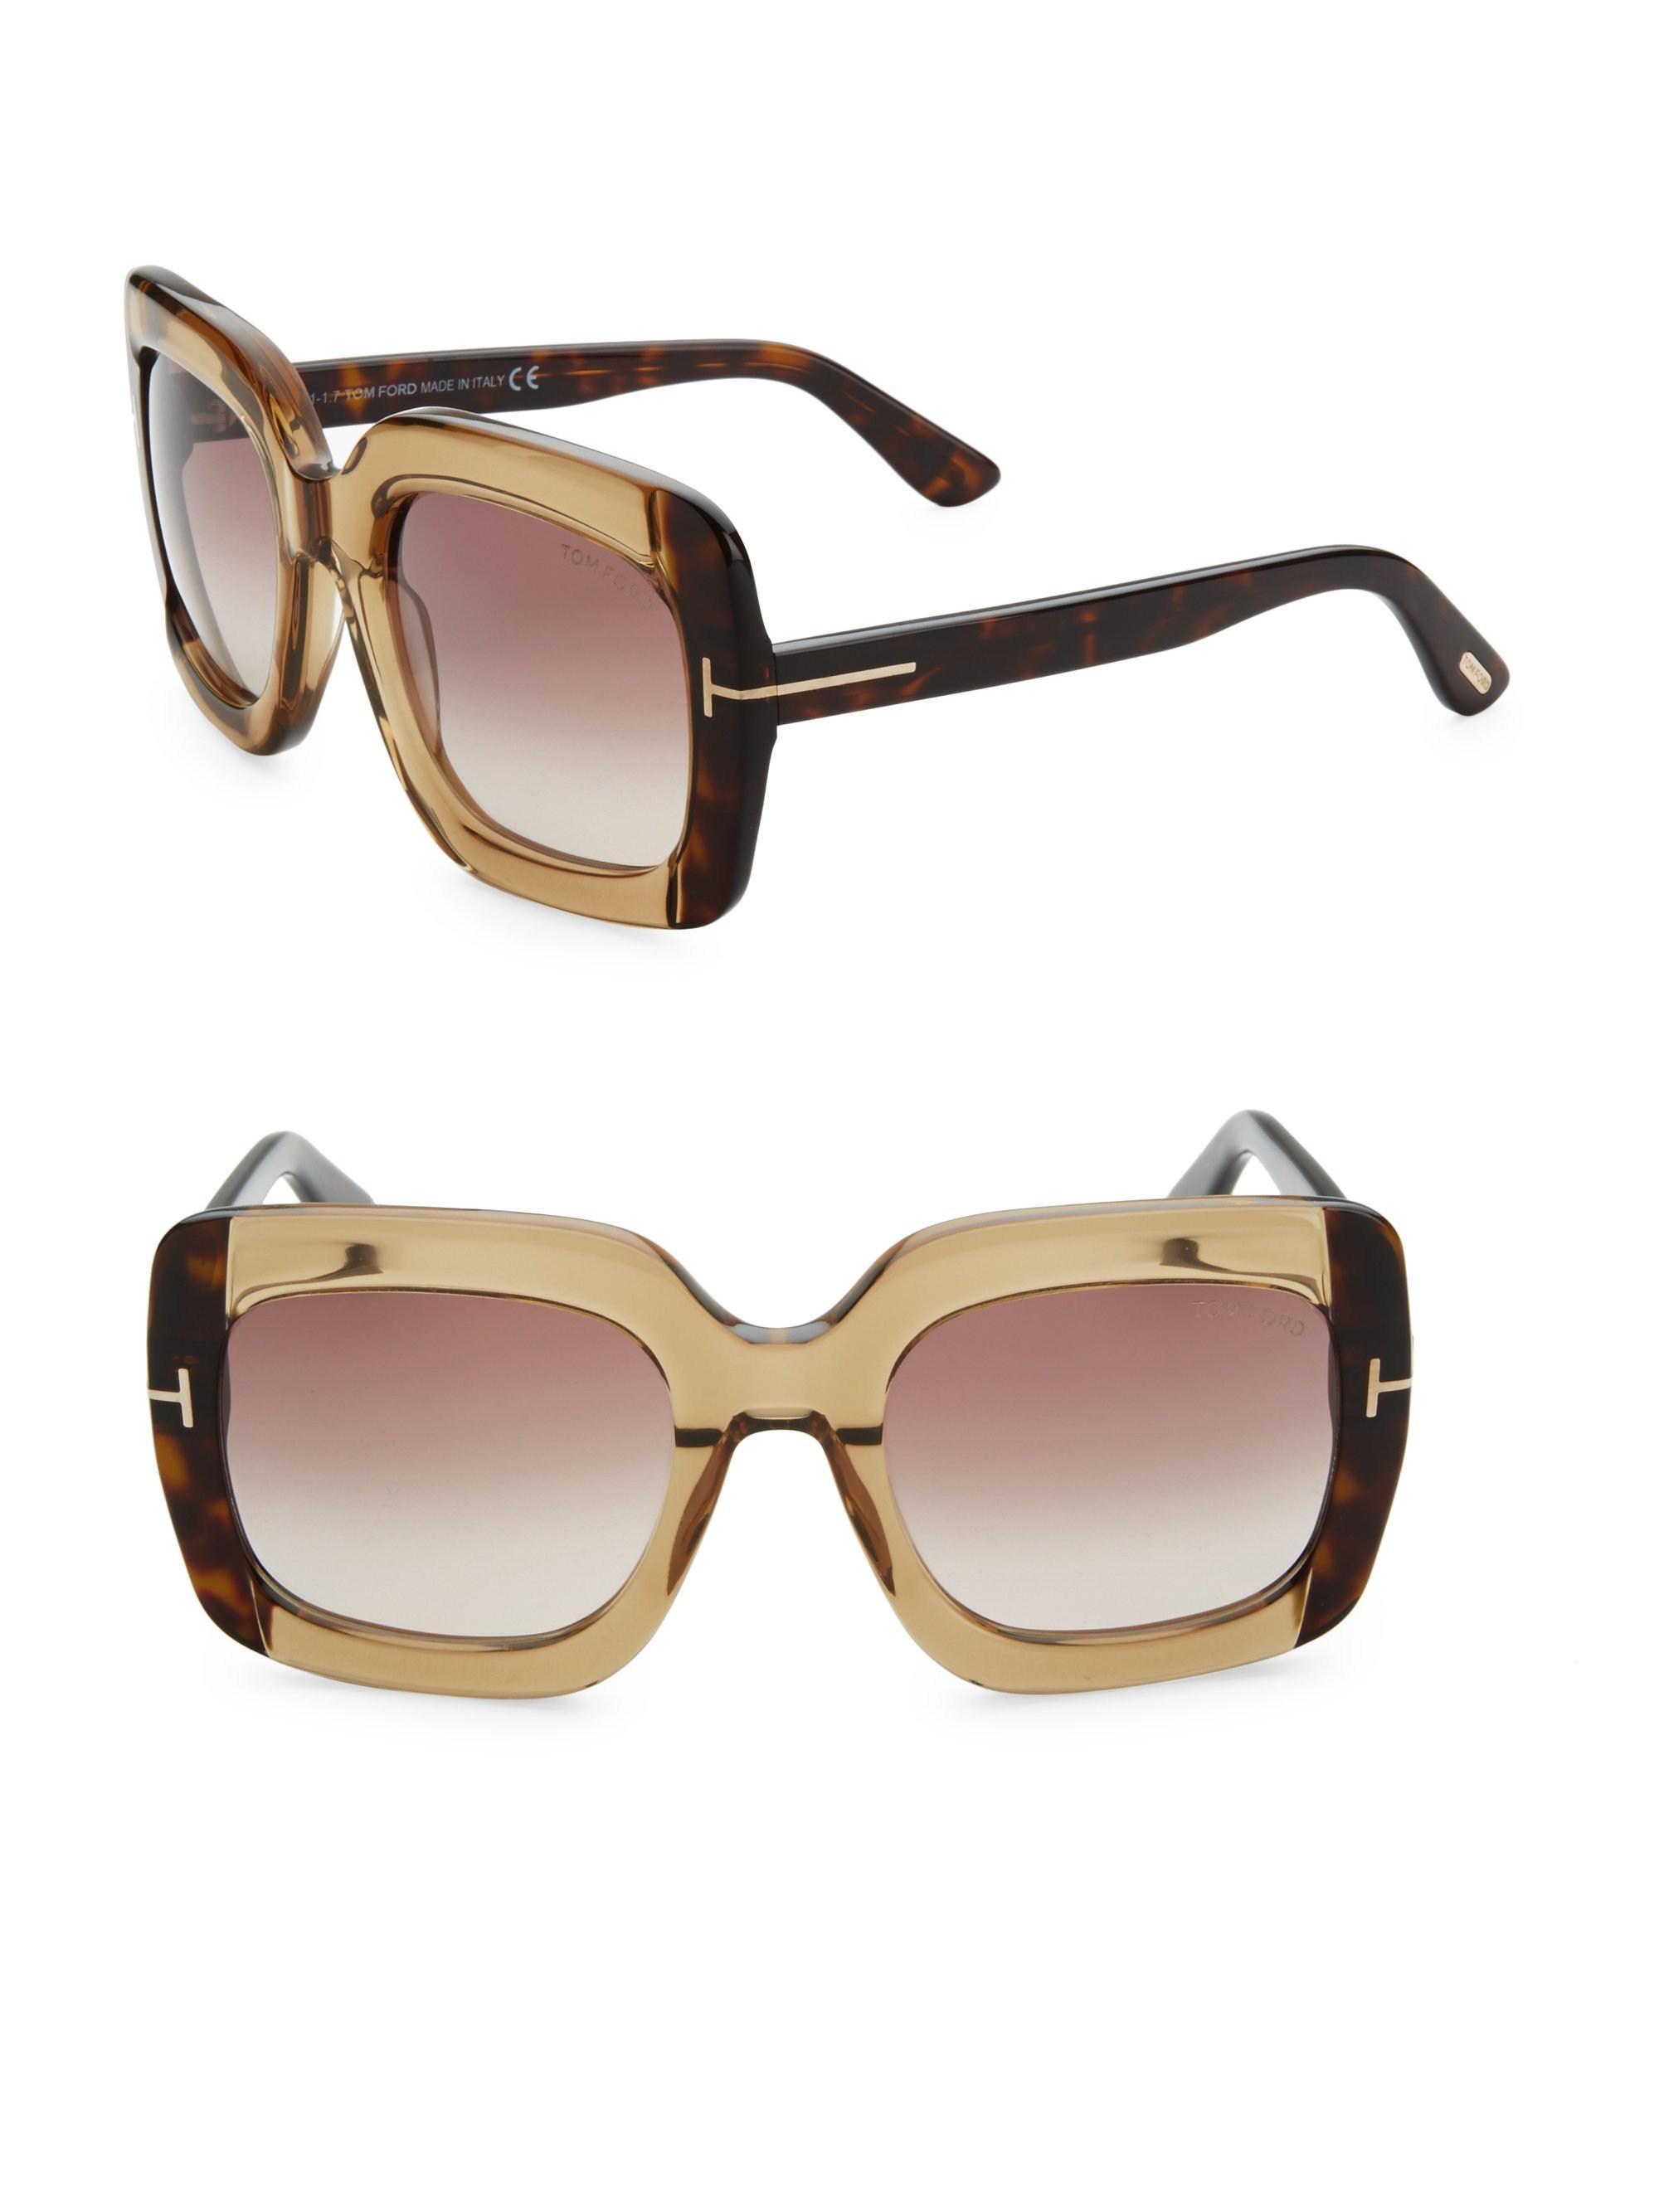 2ae4c1d0b5f Lyst - Tom Ford Women s Helene Plastic Sunglasses - Brown in Brown